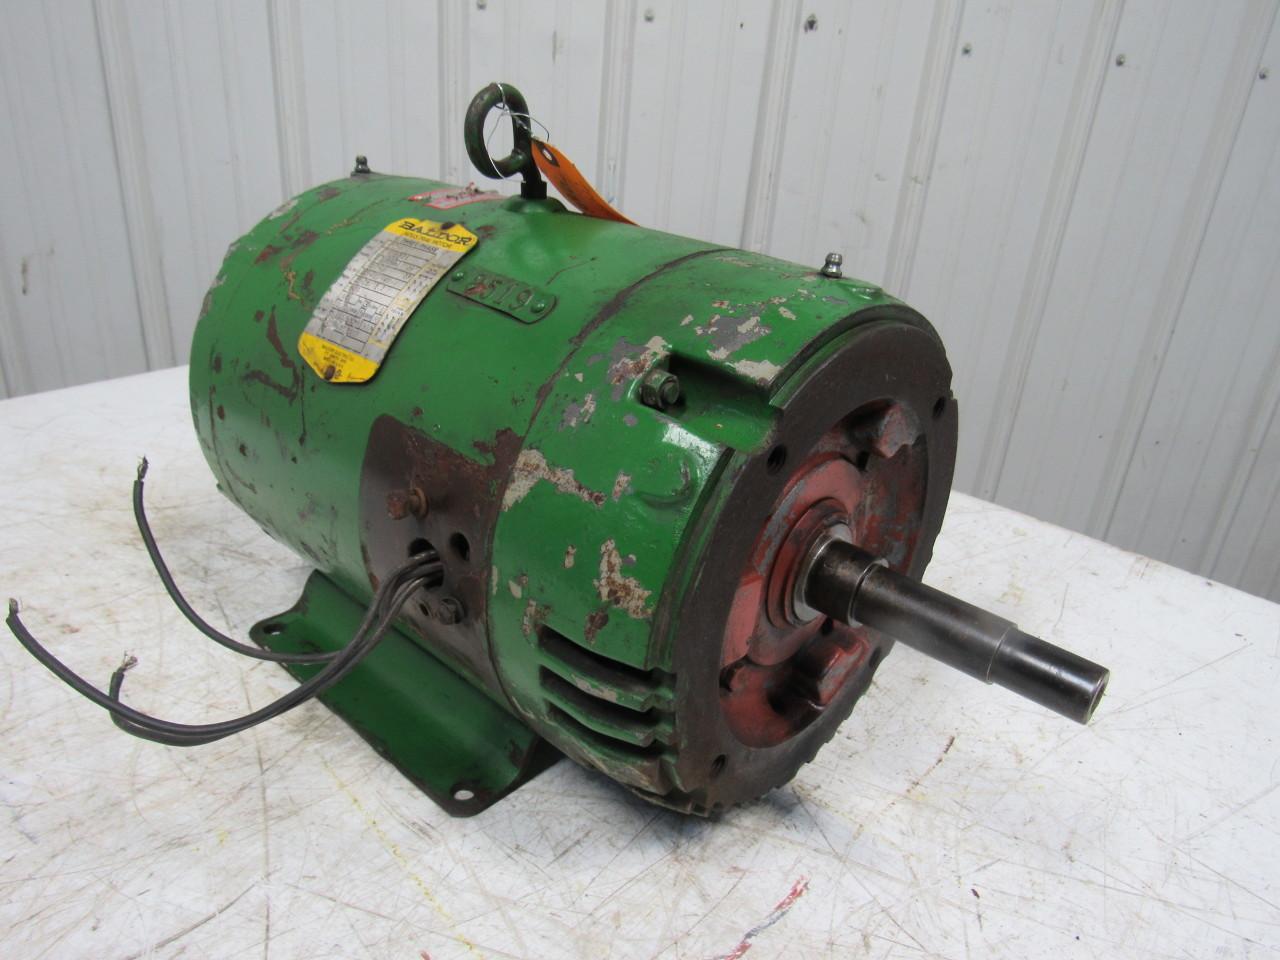 Baldor Jmm3312t 10hp Electric Motor 208 230 460v 3450 Rpm